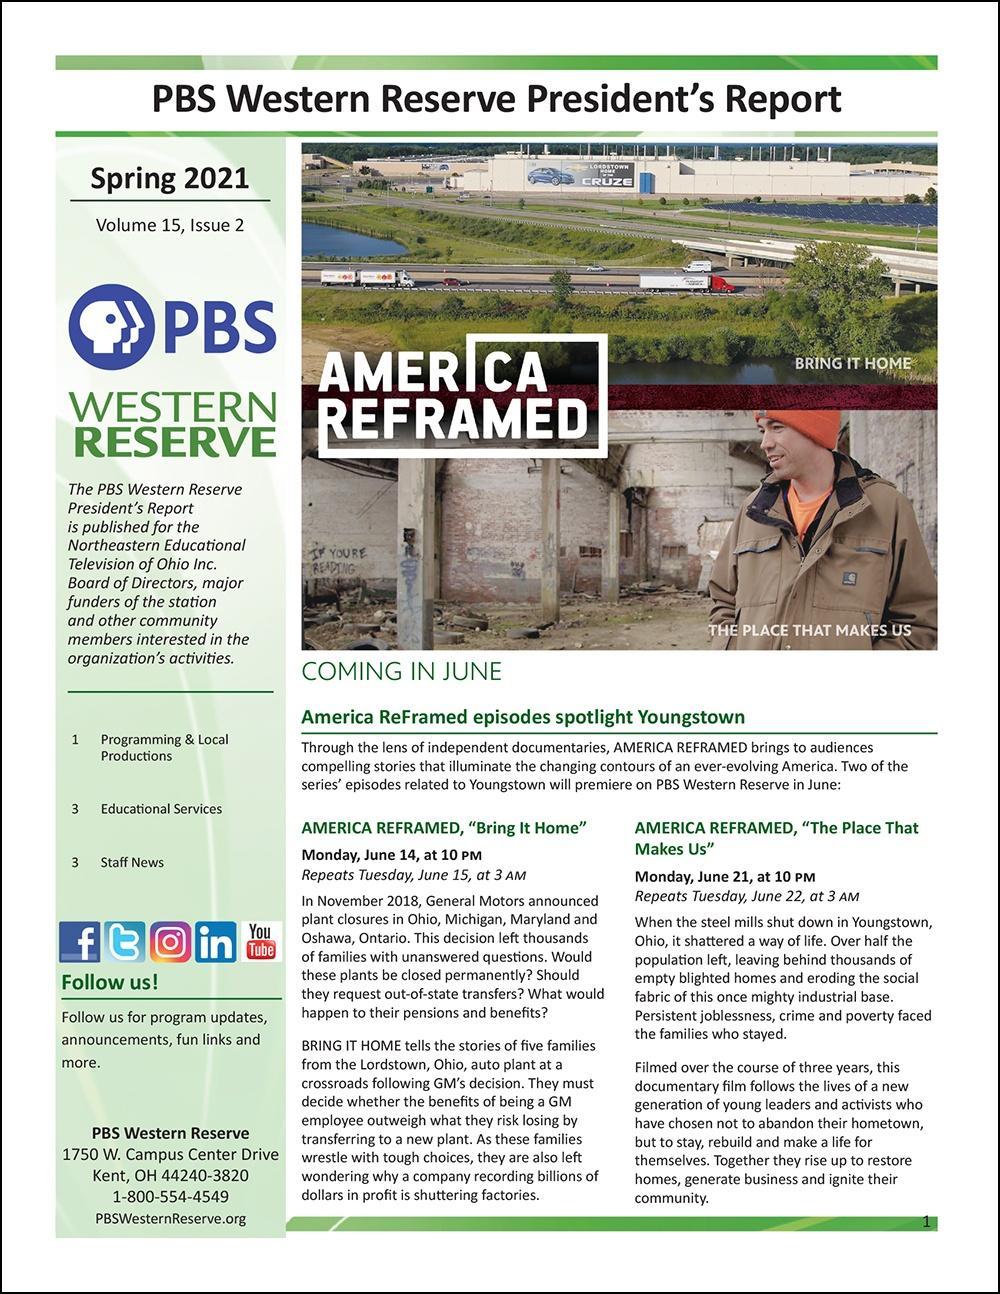 Spring 2021 - Volume 15, Issue 2